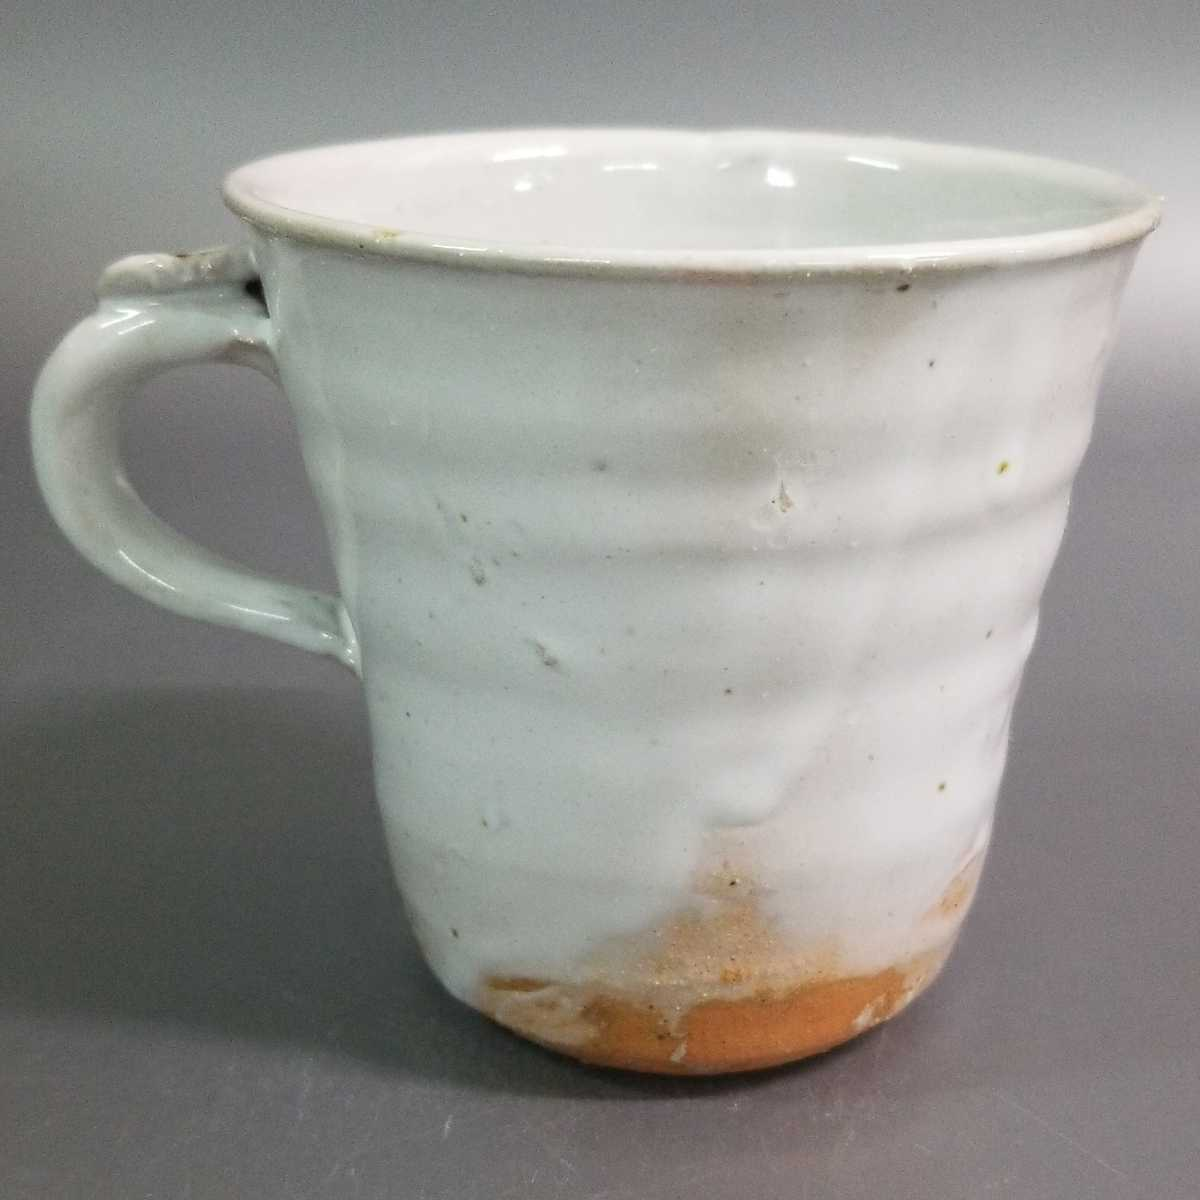 賜72)萩焼 渋谷泥詩 白萩マグカップ 珈琲器 茶器 未使用新品 同梱歓迎 _画像4